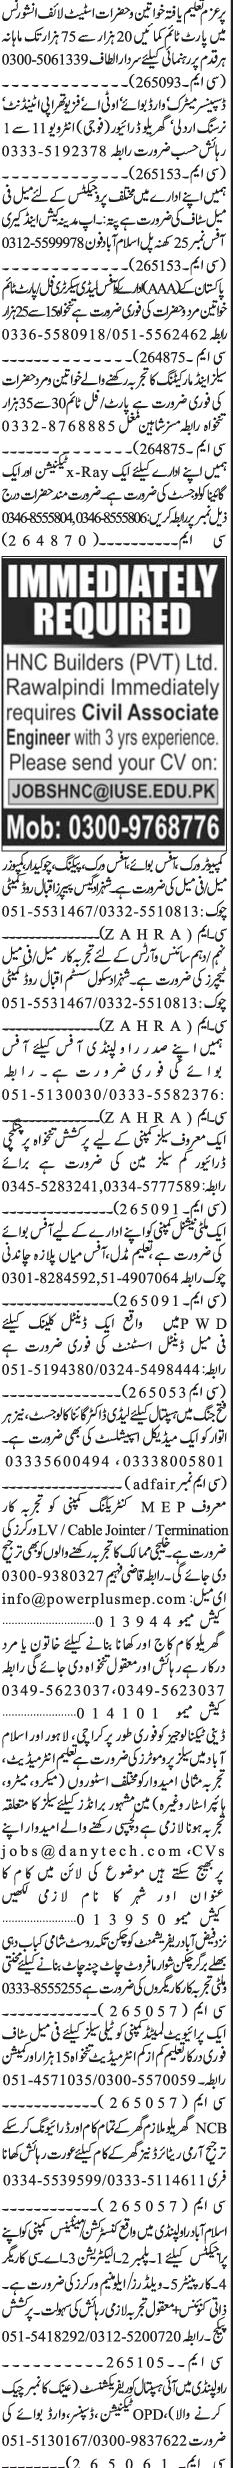 Dispensers, HTV / LTV Drivers, Lady Secretary Wanted